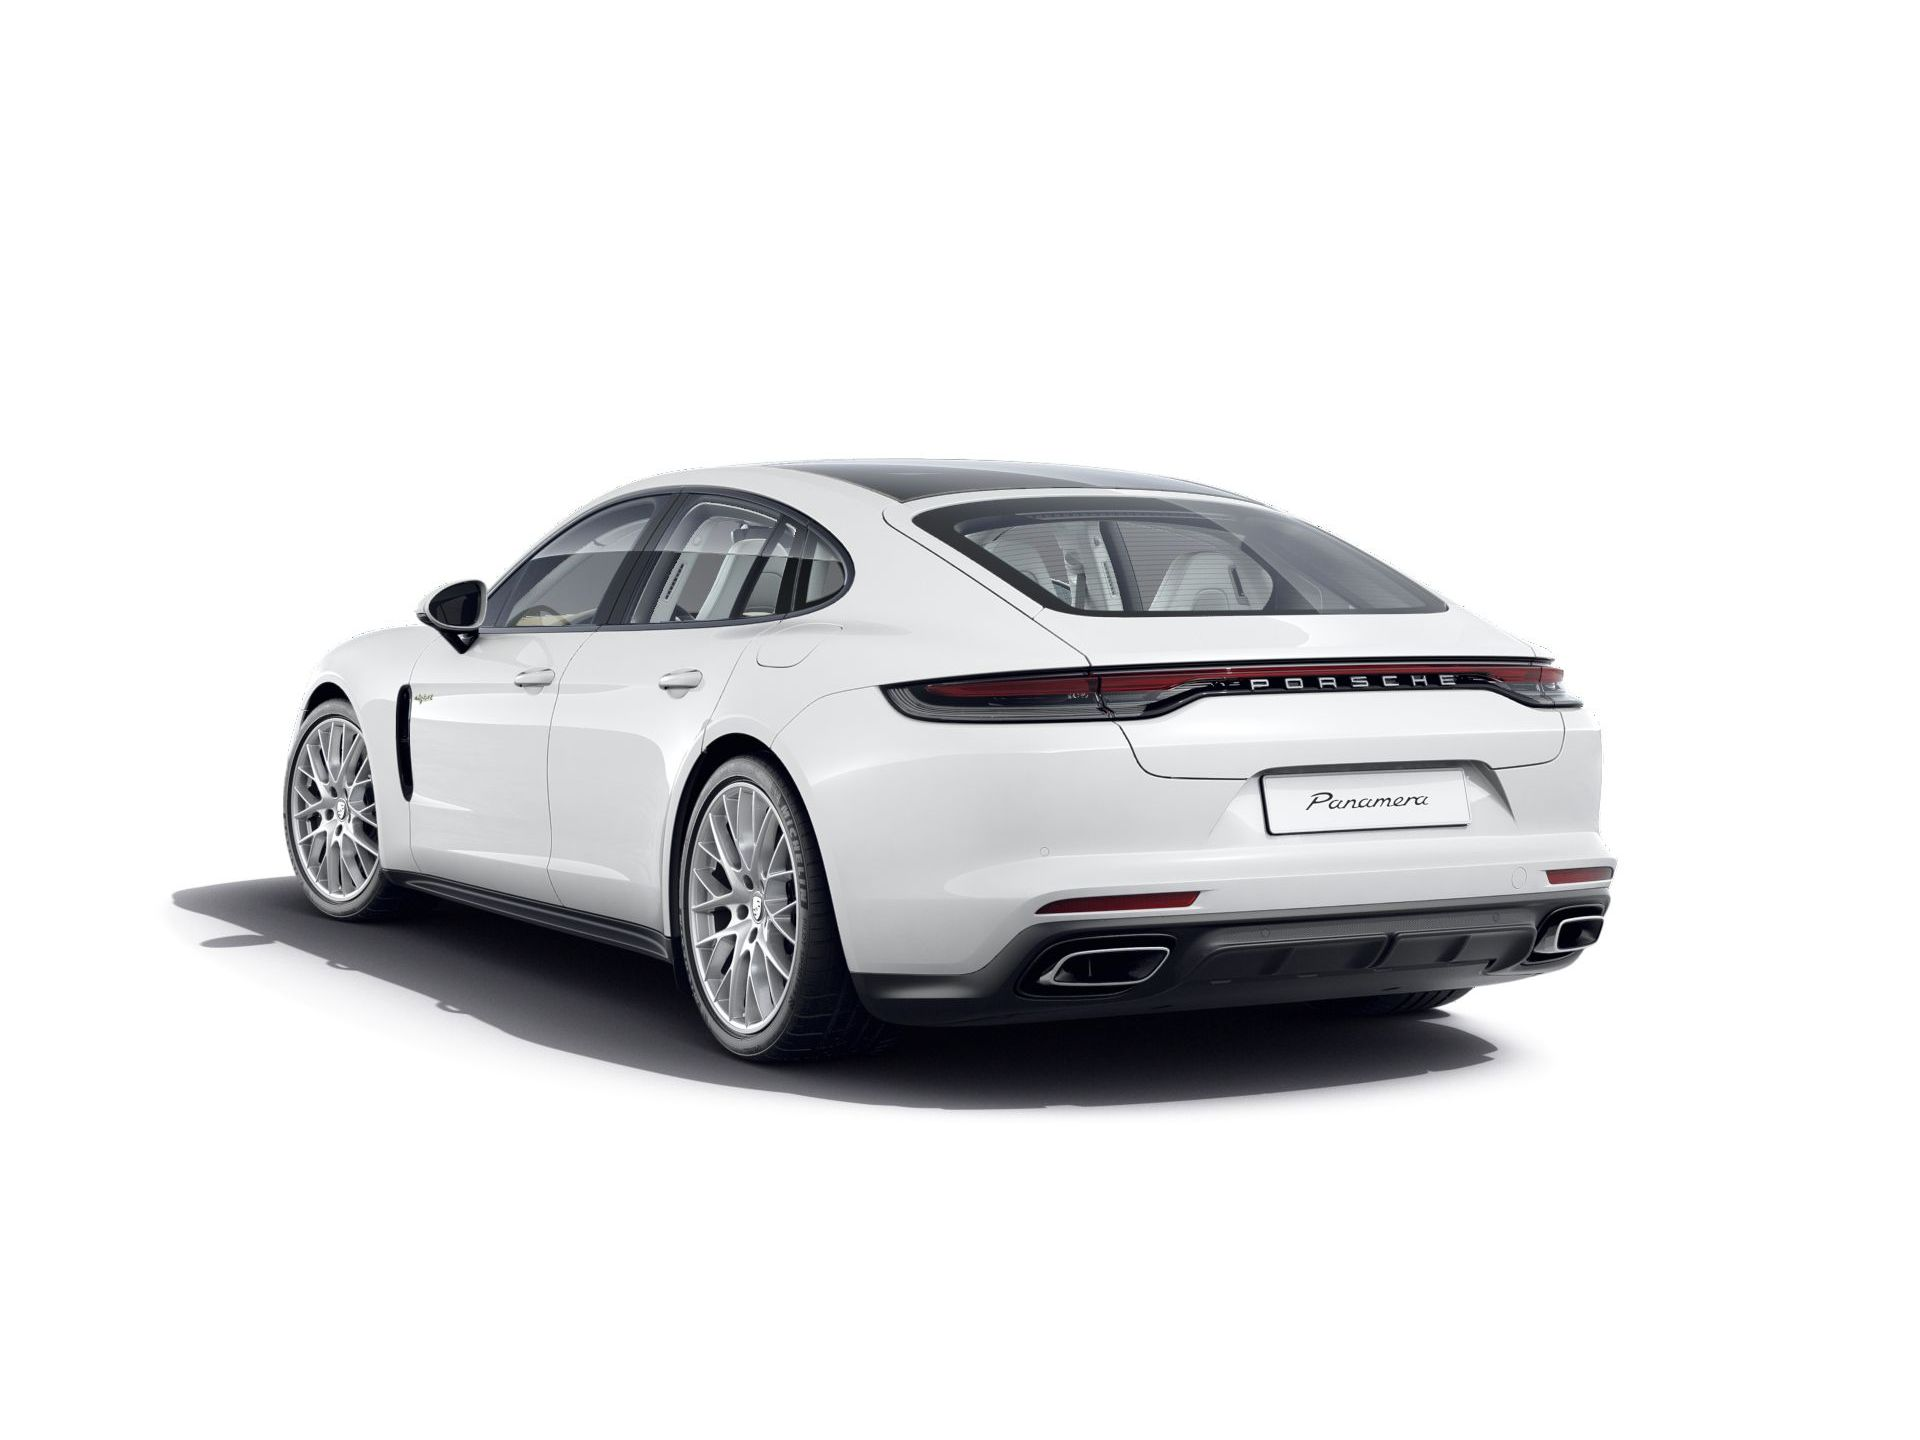 2021 Porsche Panamera 4 E-Hybrid – 3